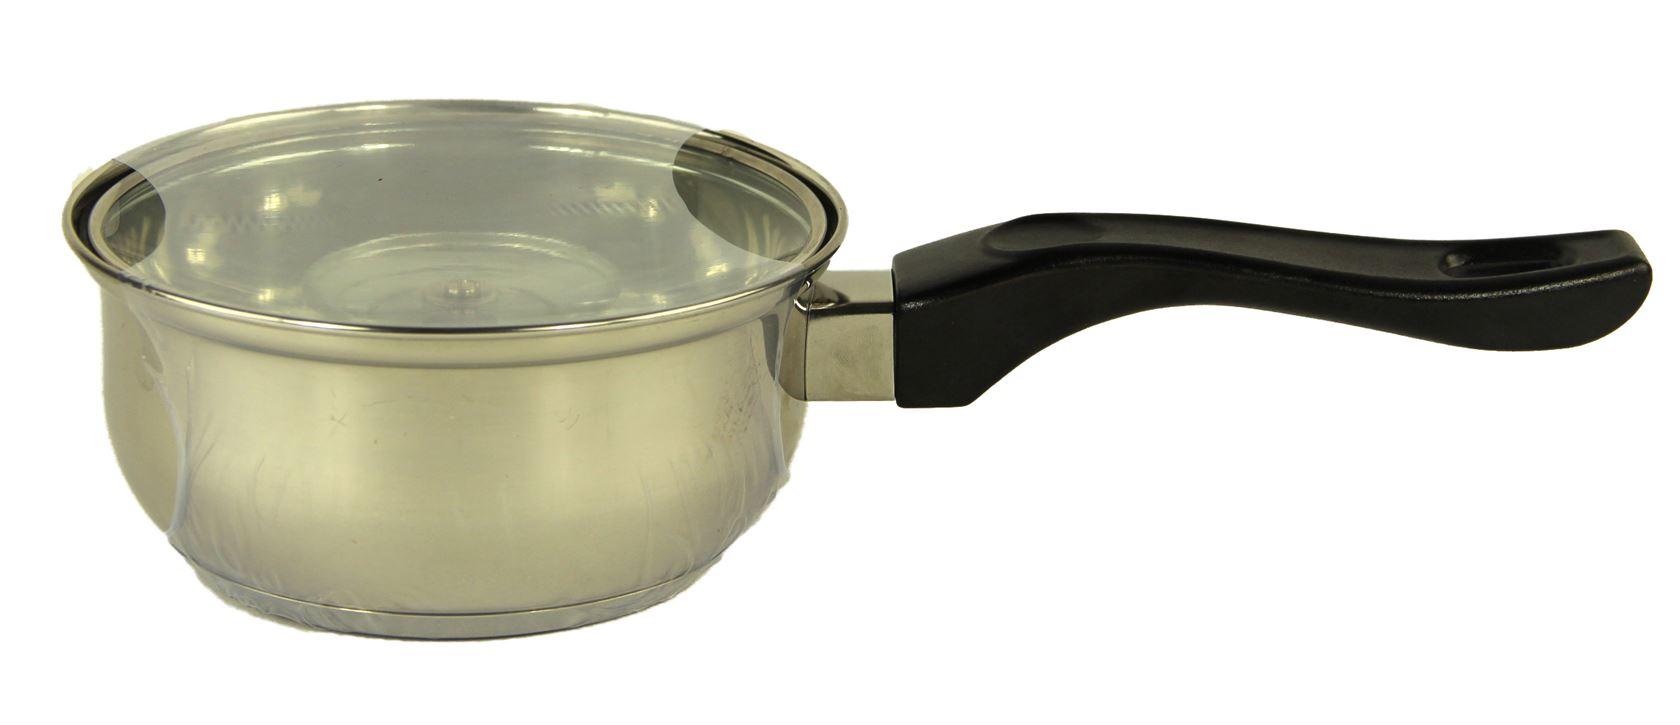 haute cuisine bakeliet steelpan + deksel